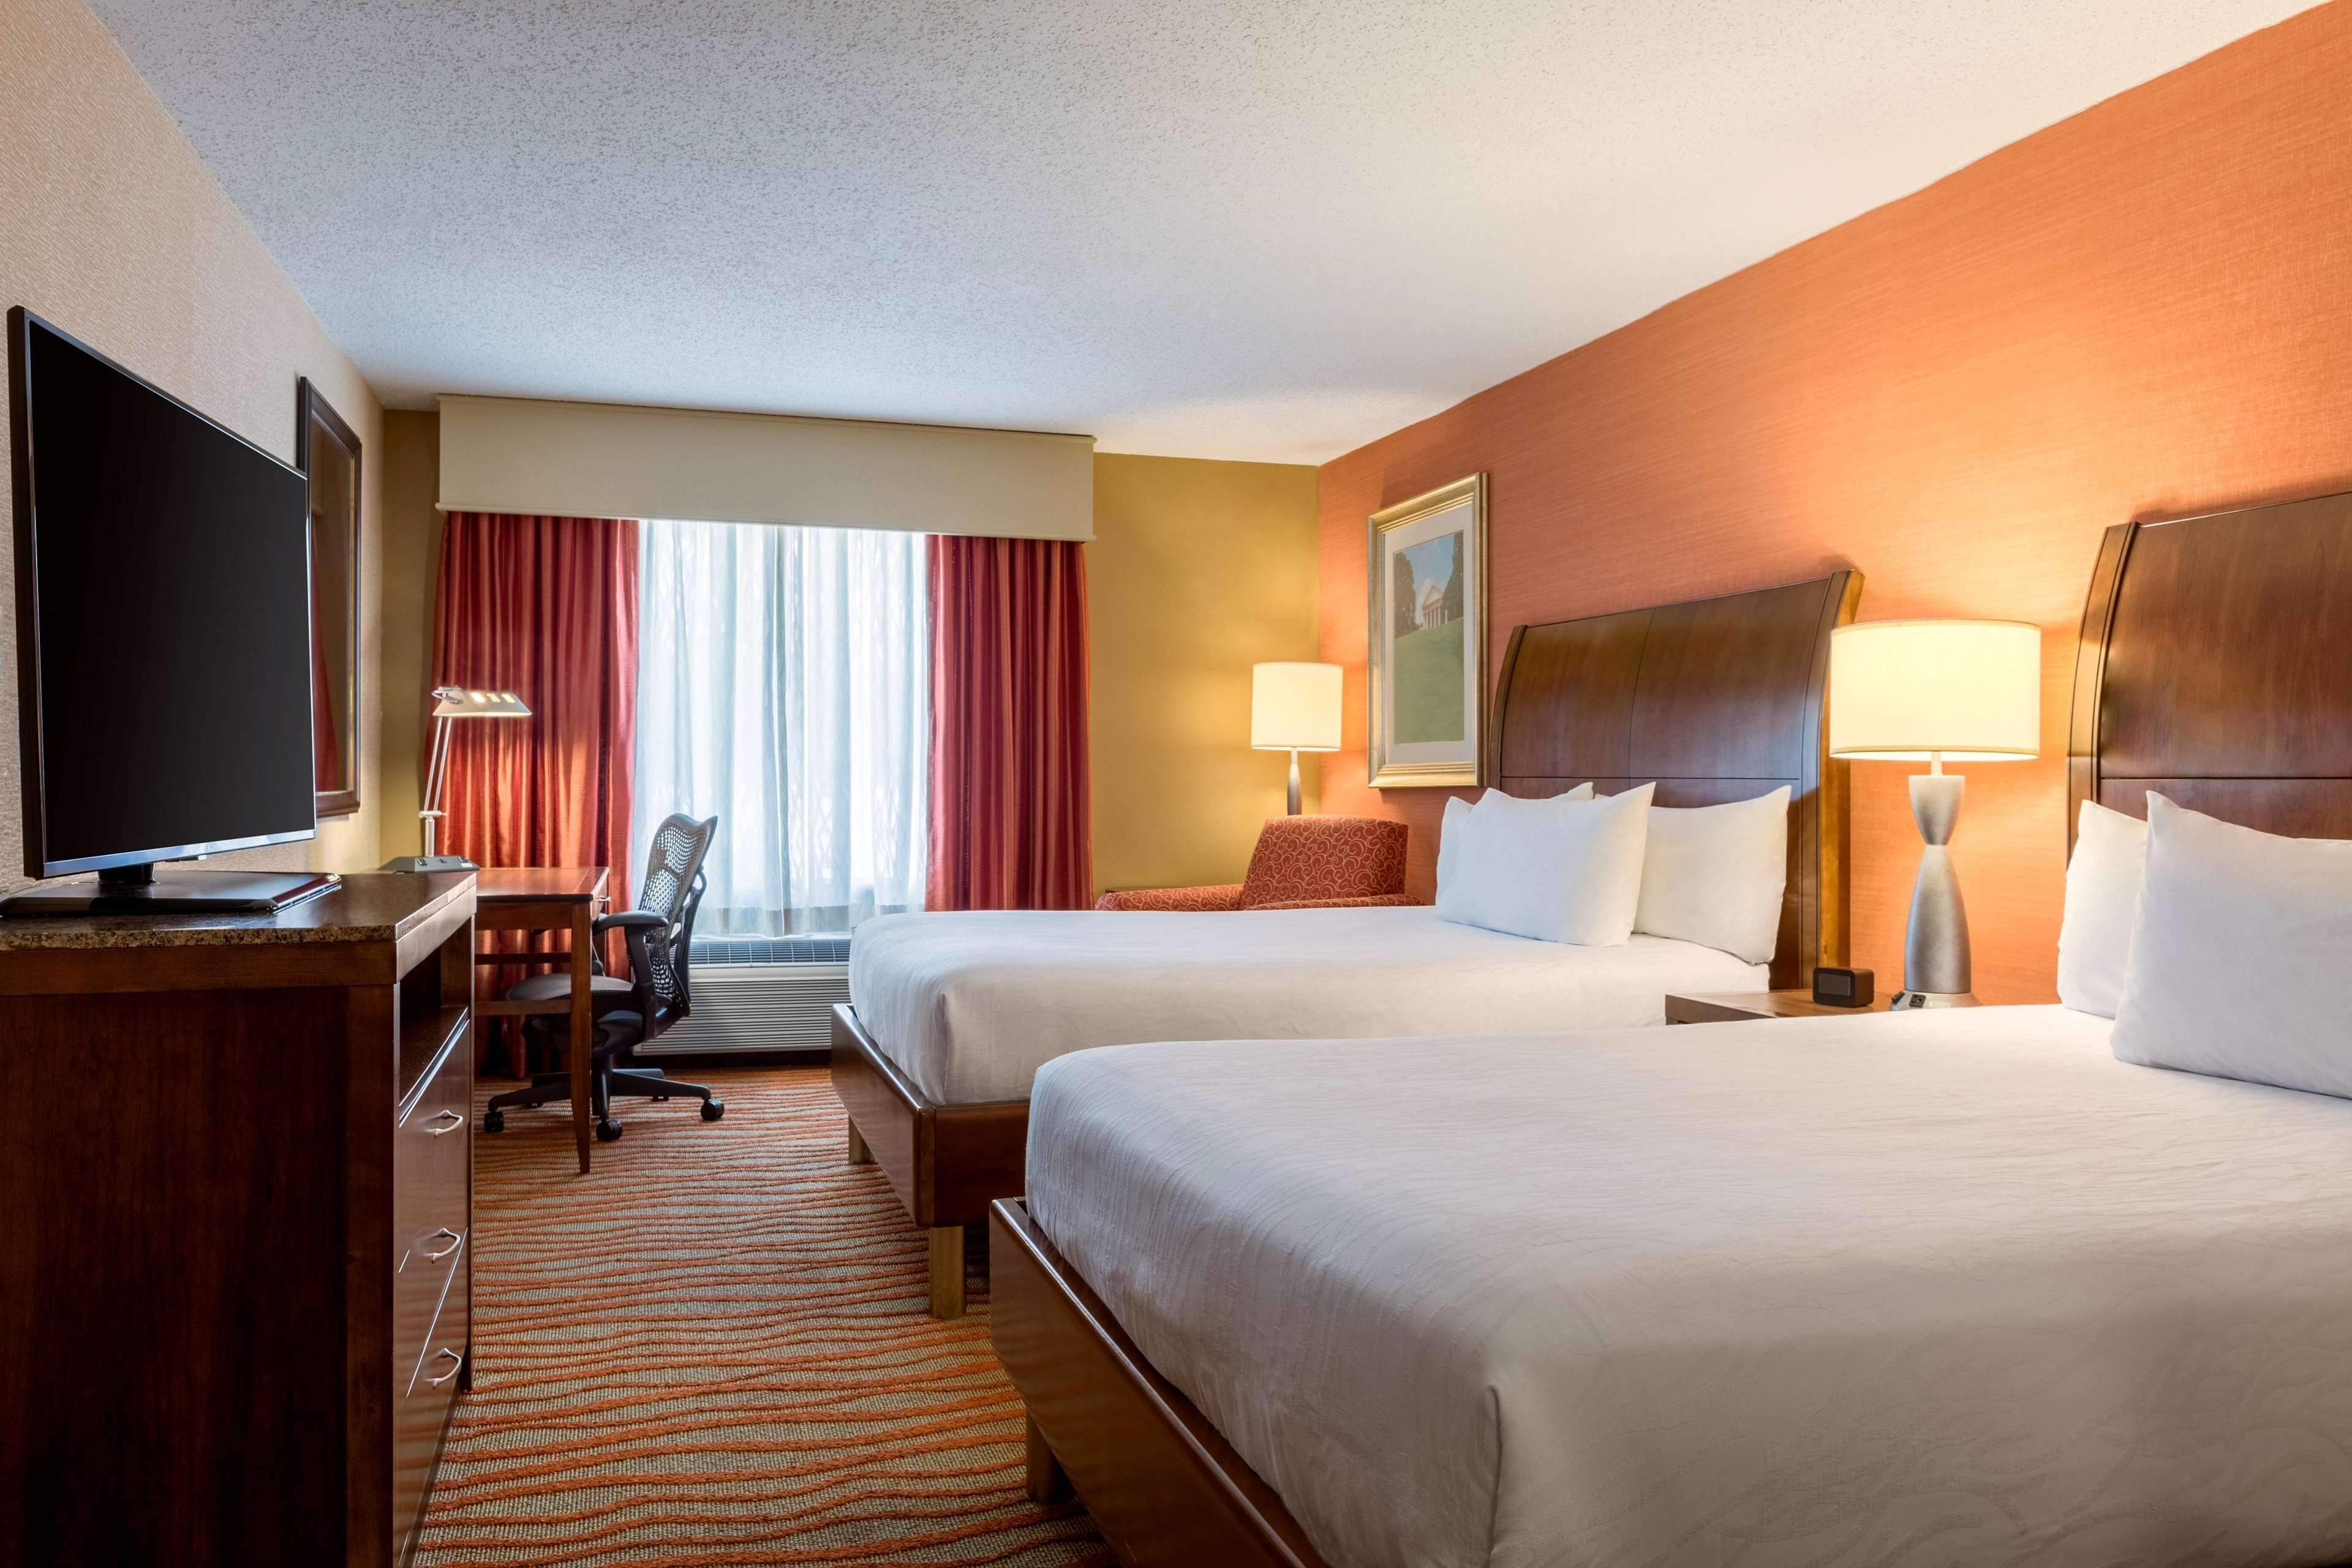 Hilton Garden Inn Arlington/Courthouse Plaza image 32